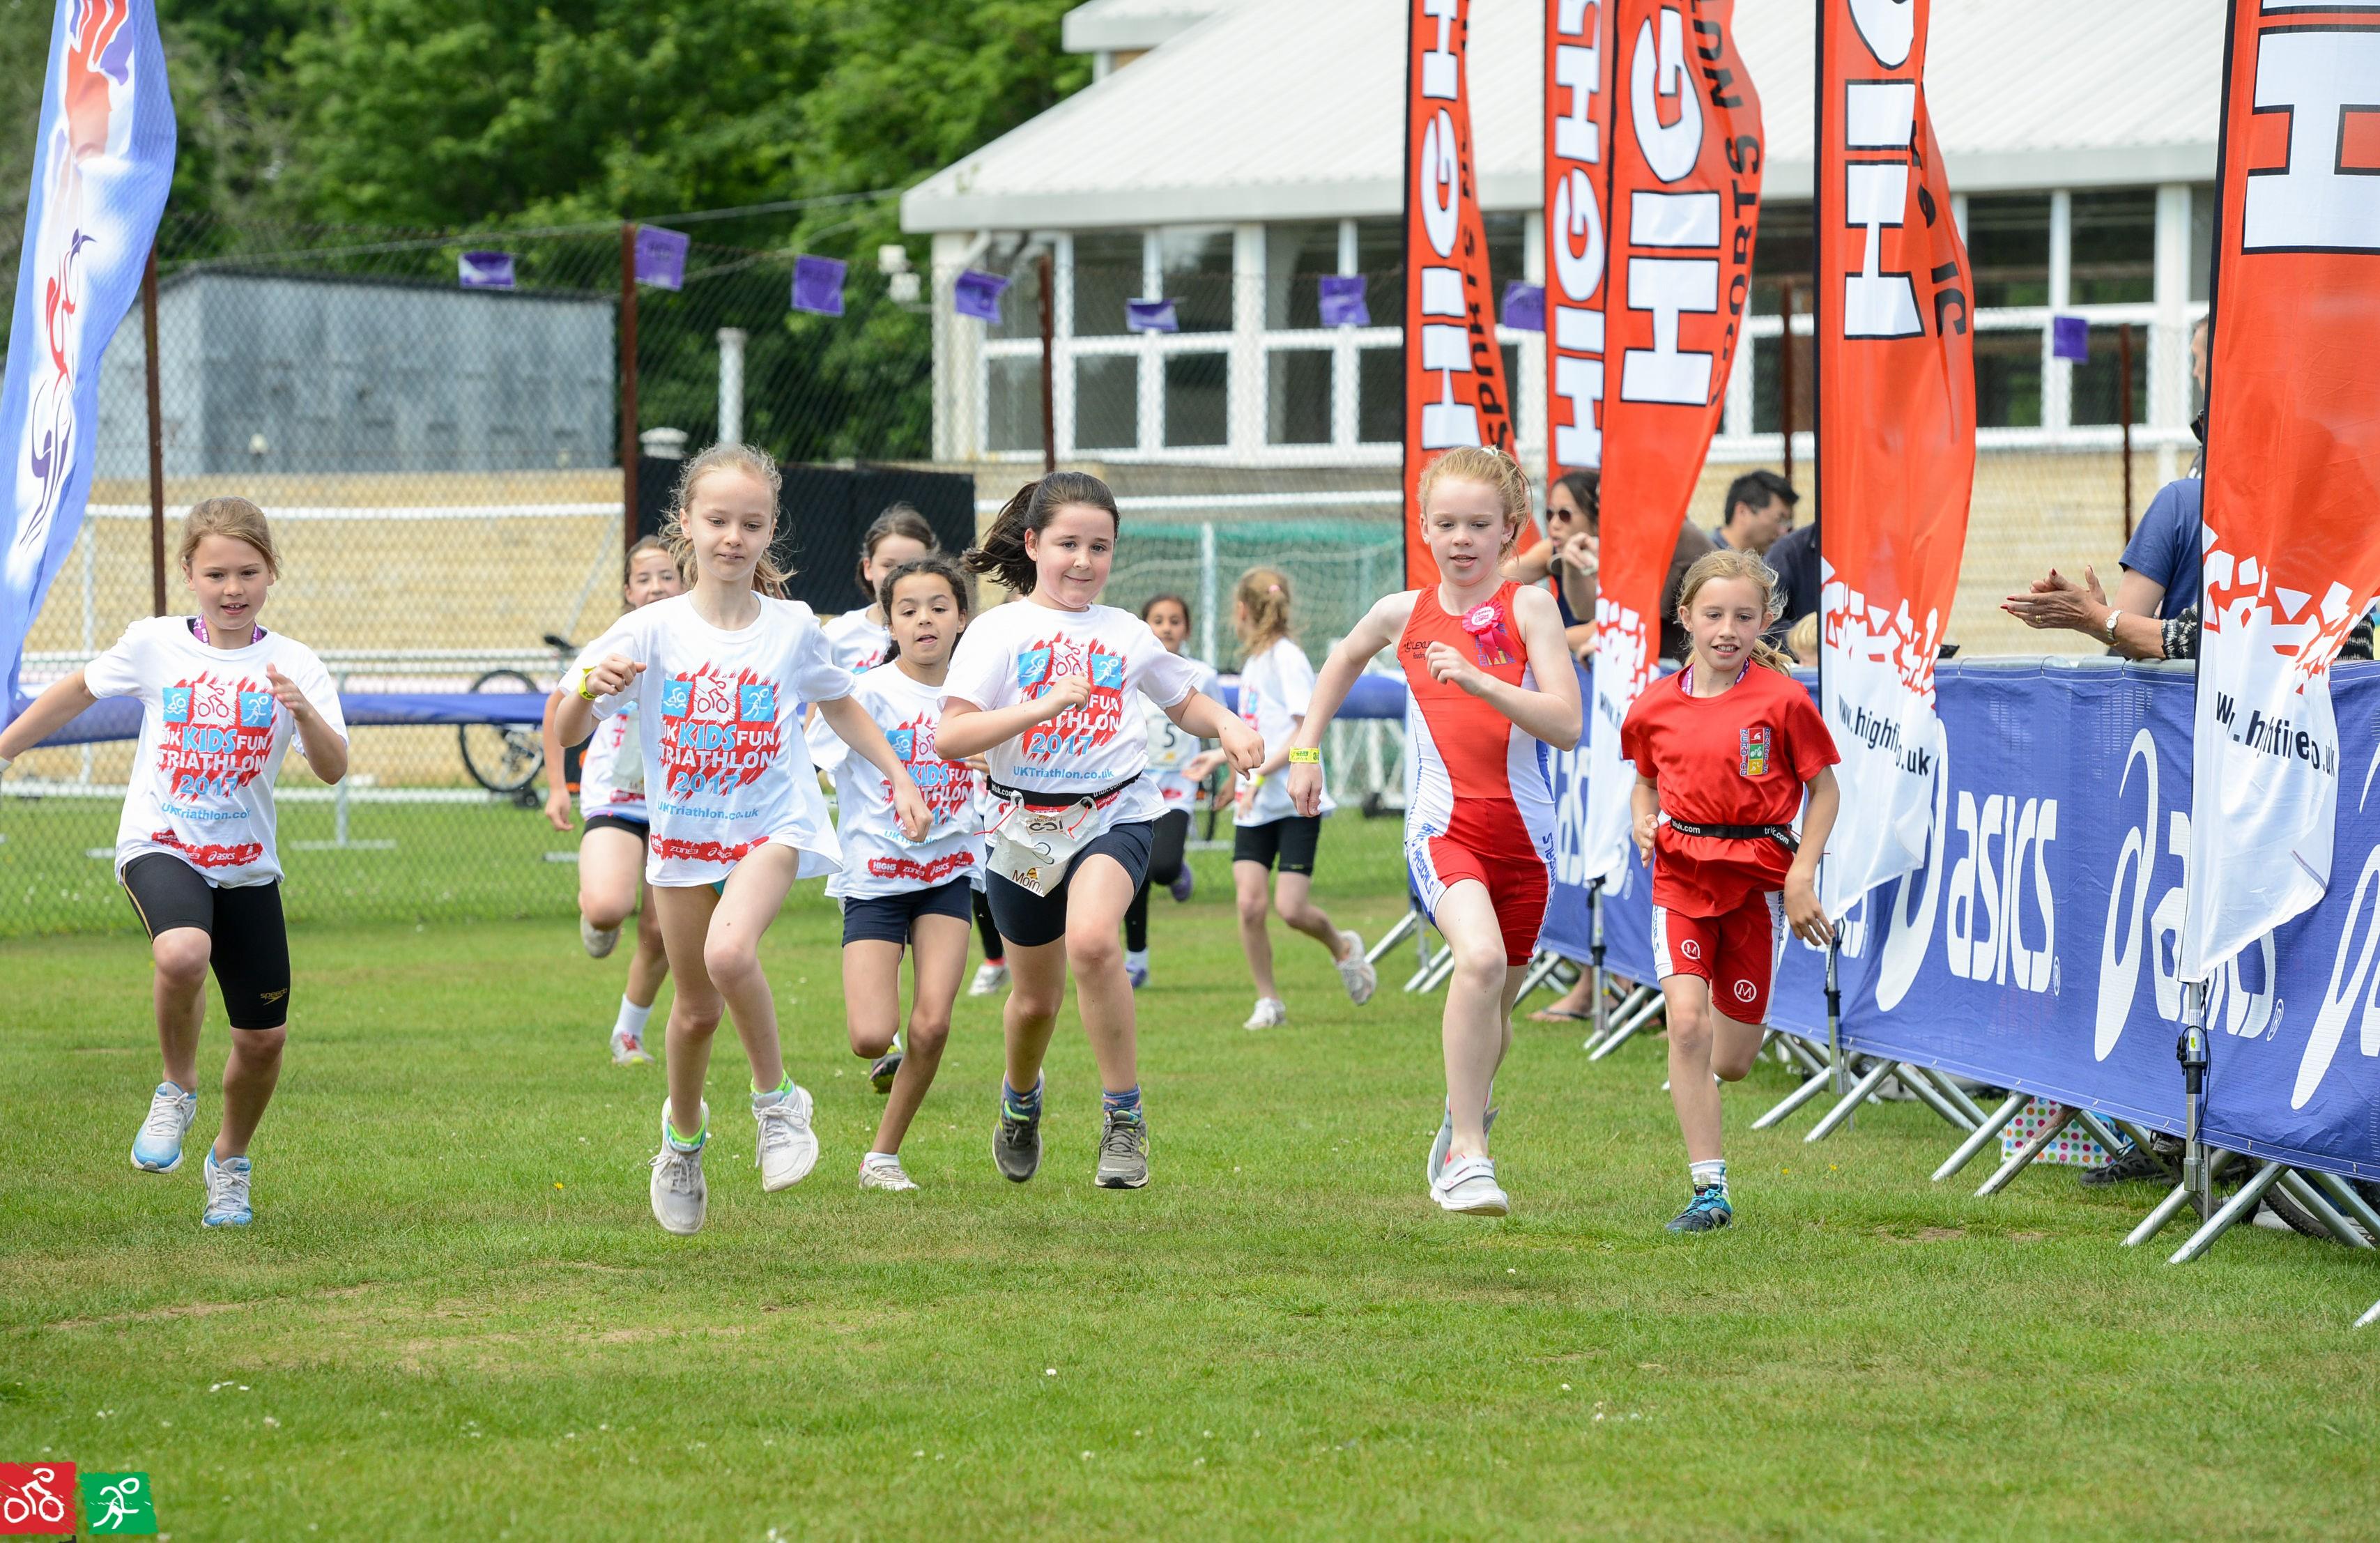 Henley Kids Fun Triathlon - cover image